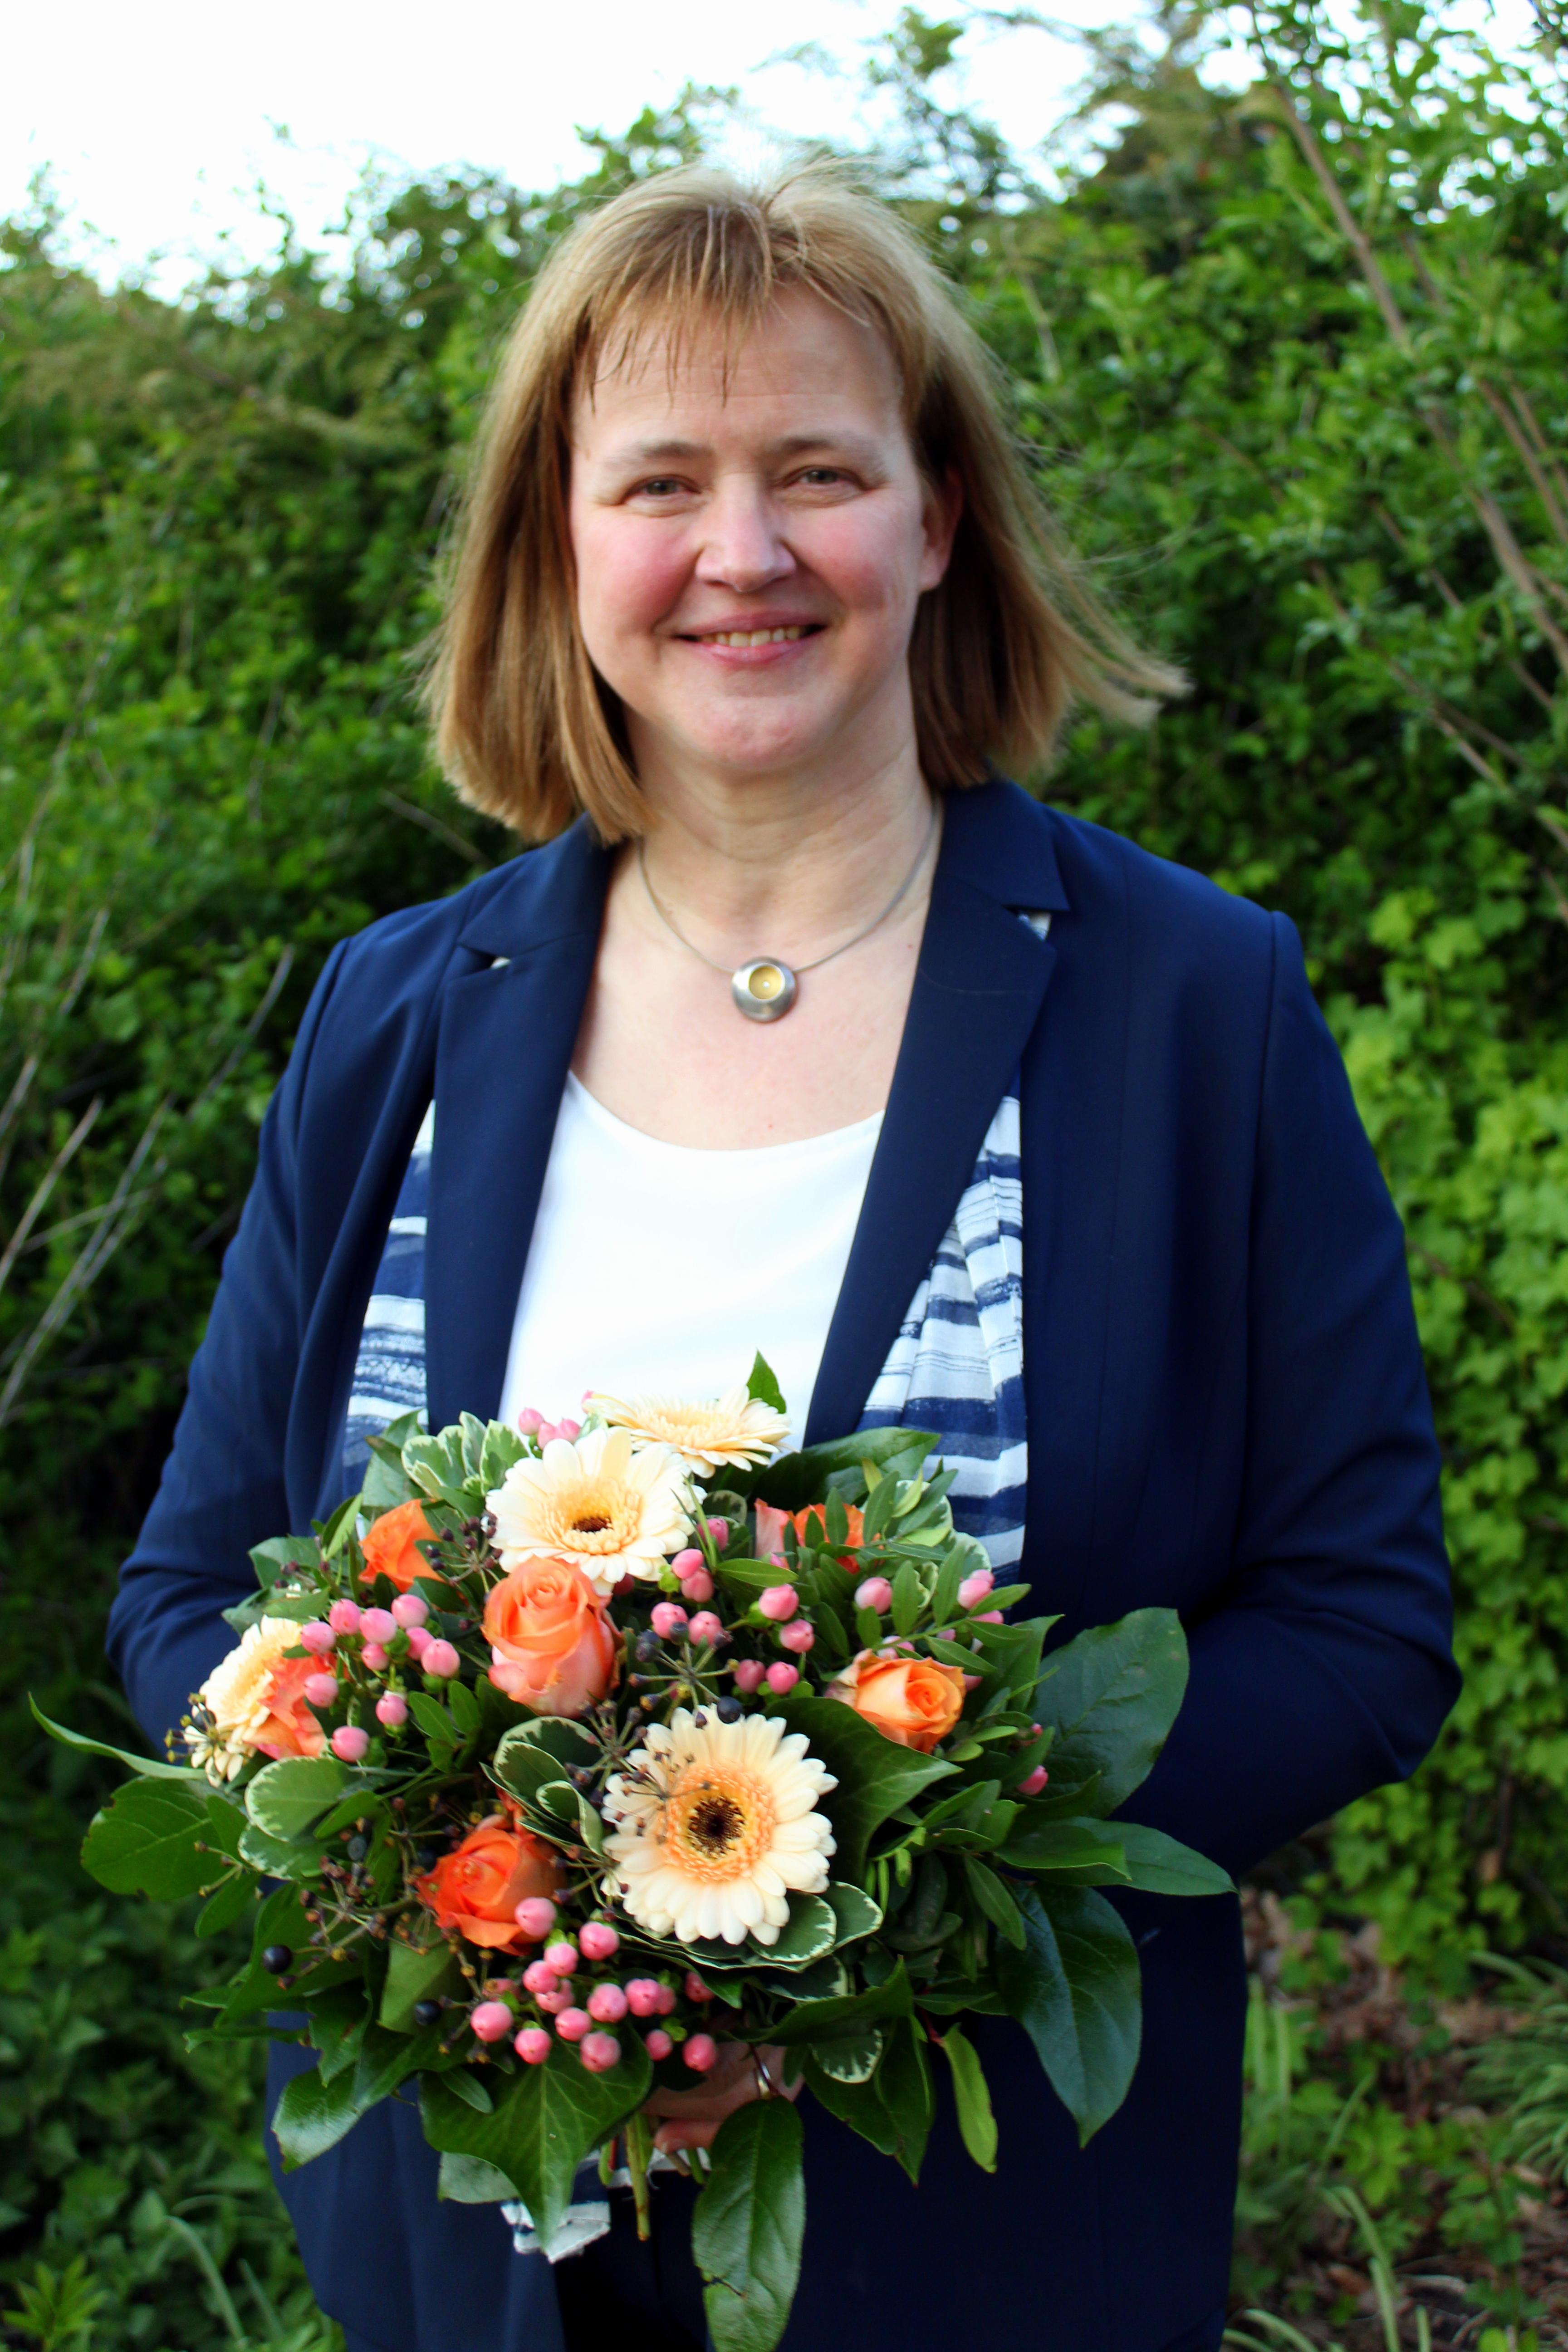 Anja Boettcher Bürgermeisterkandidatin Hohenhameln